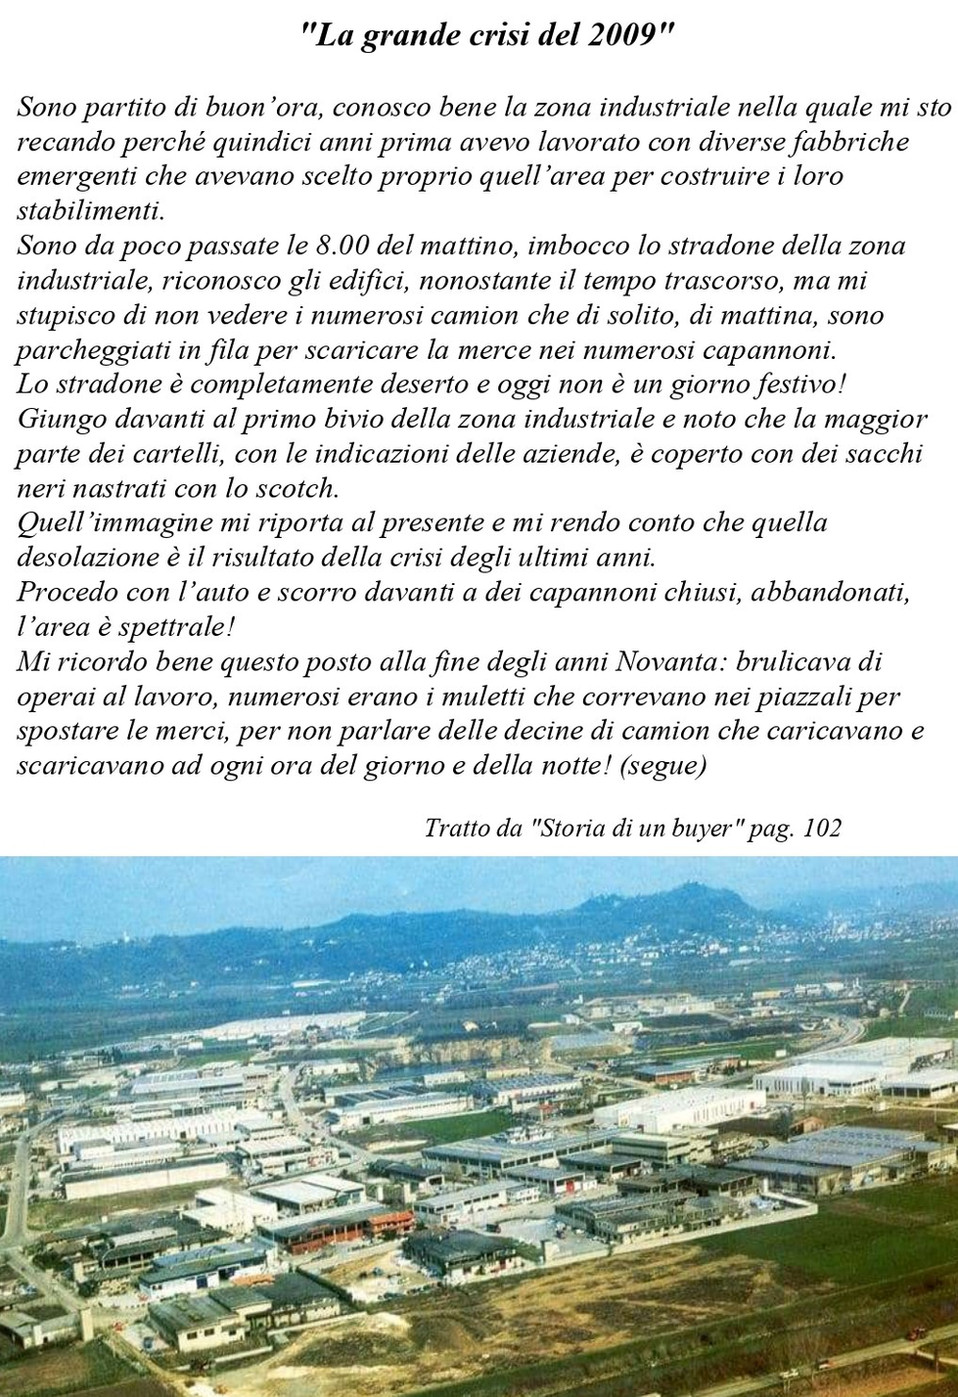 9 La grande crisi del 2009_page-0001.jpg